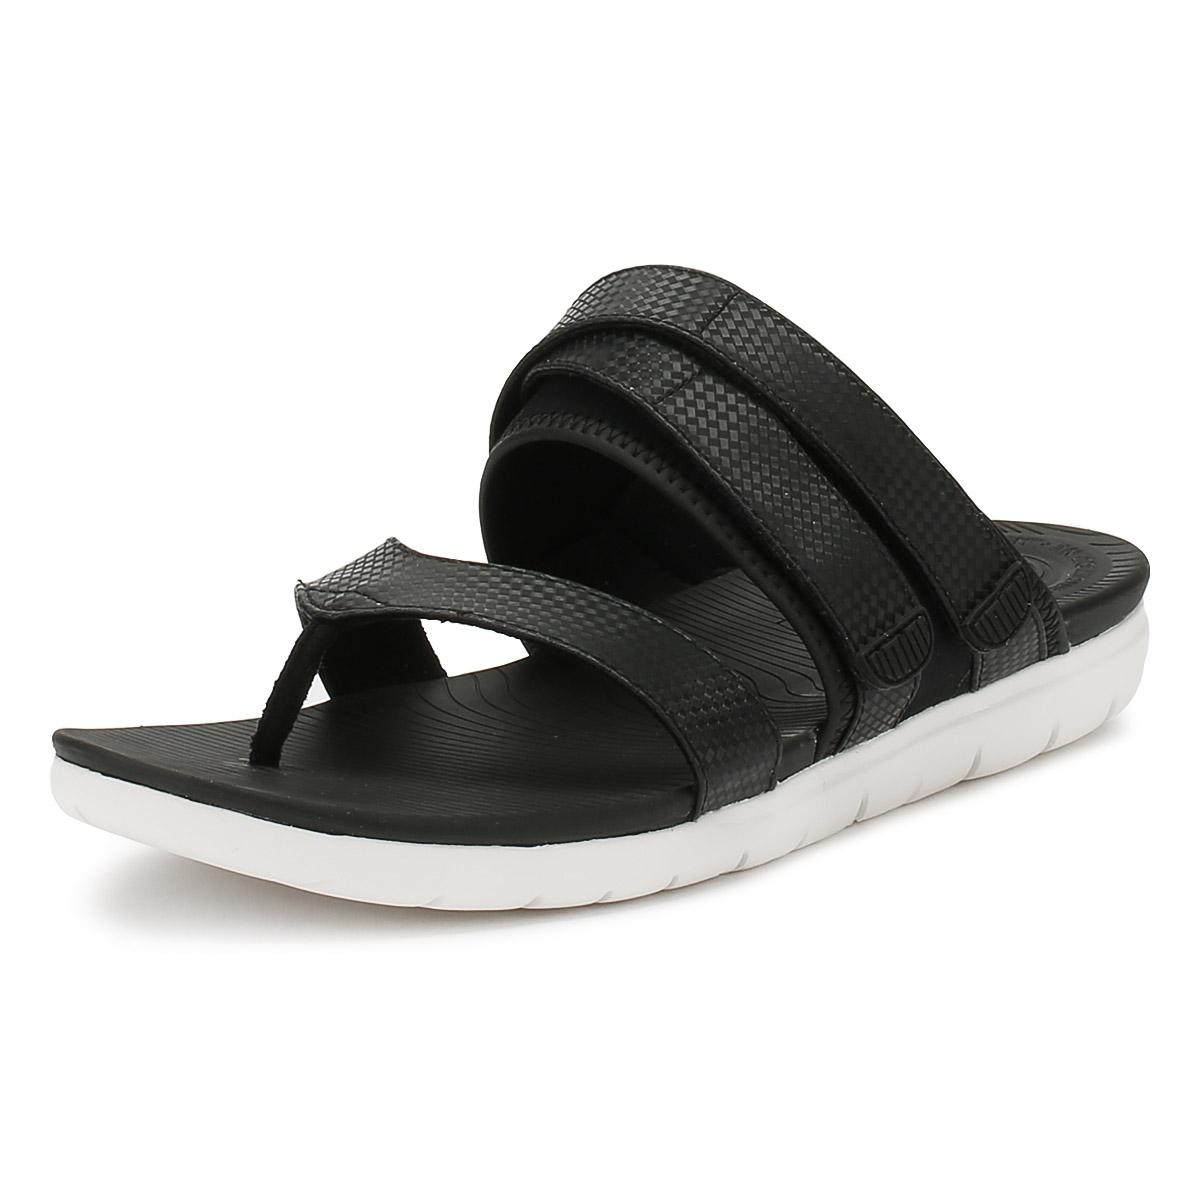 e8738a8db1805 FitFlop Neoflex Toe Thong - Black Mix (man-made) Womens Sandals 7 UK ...